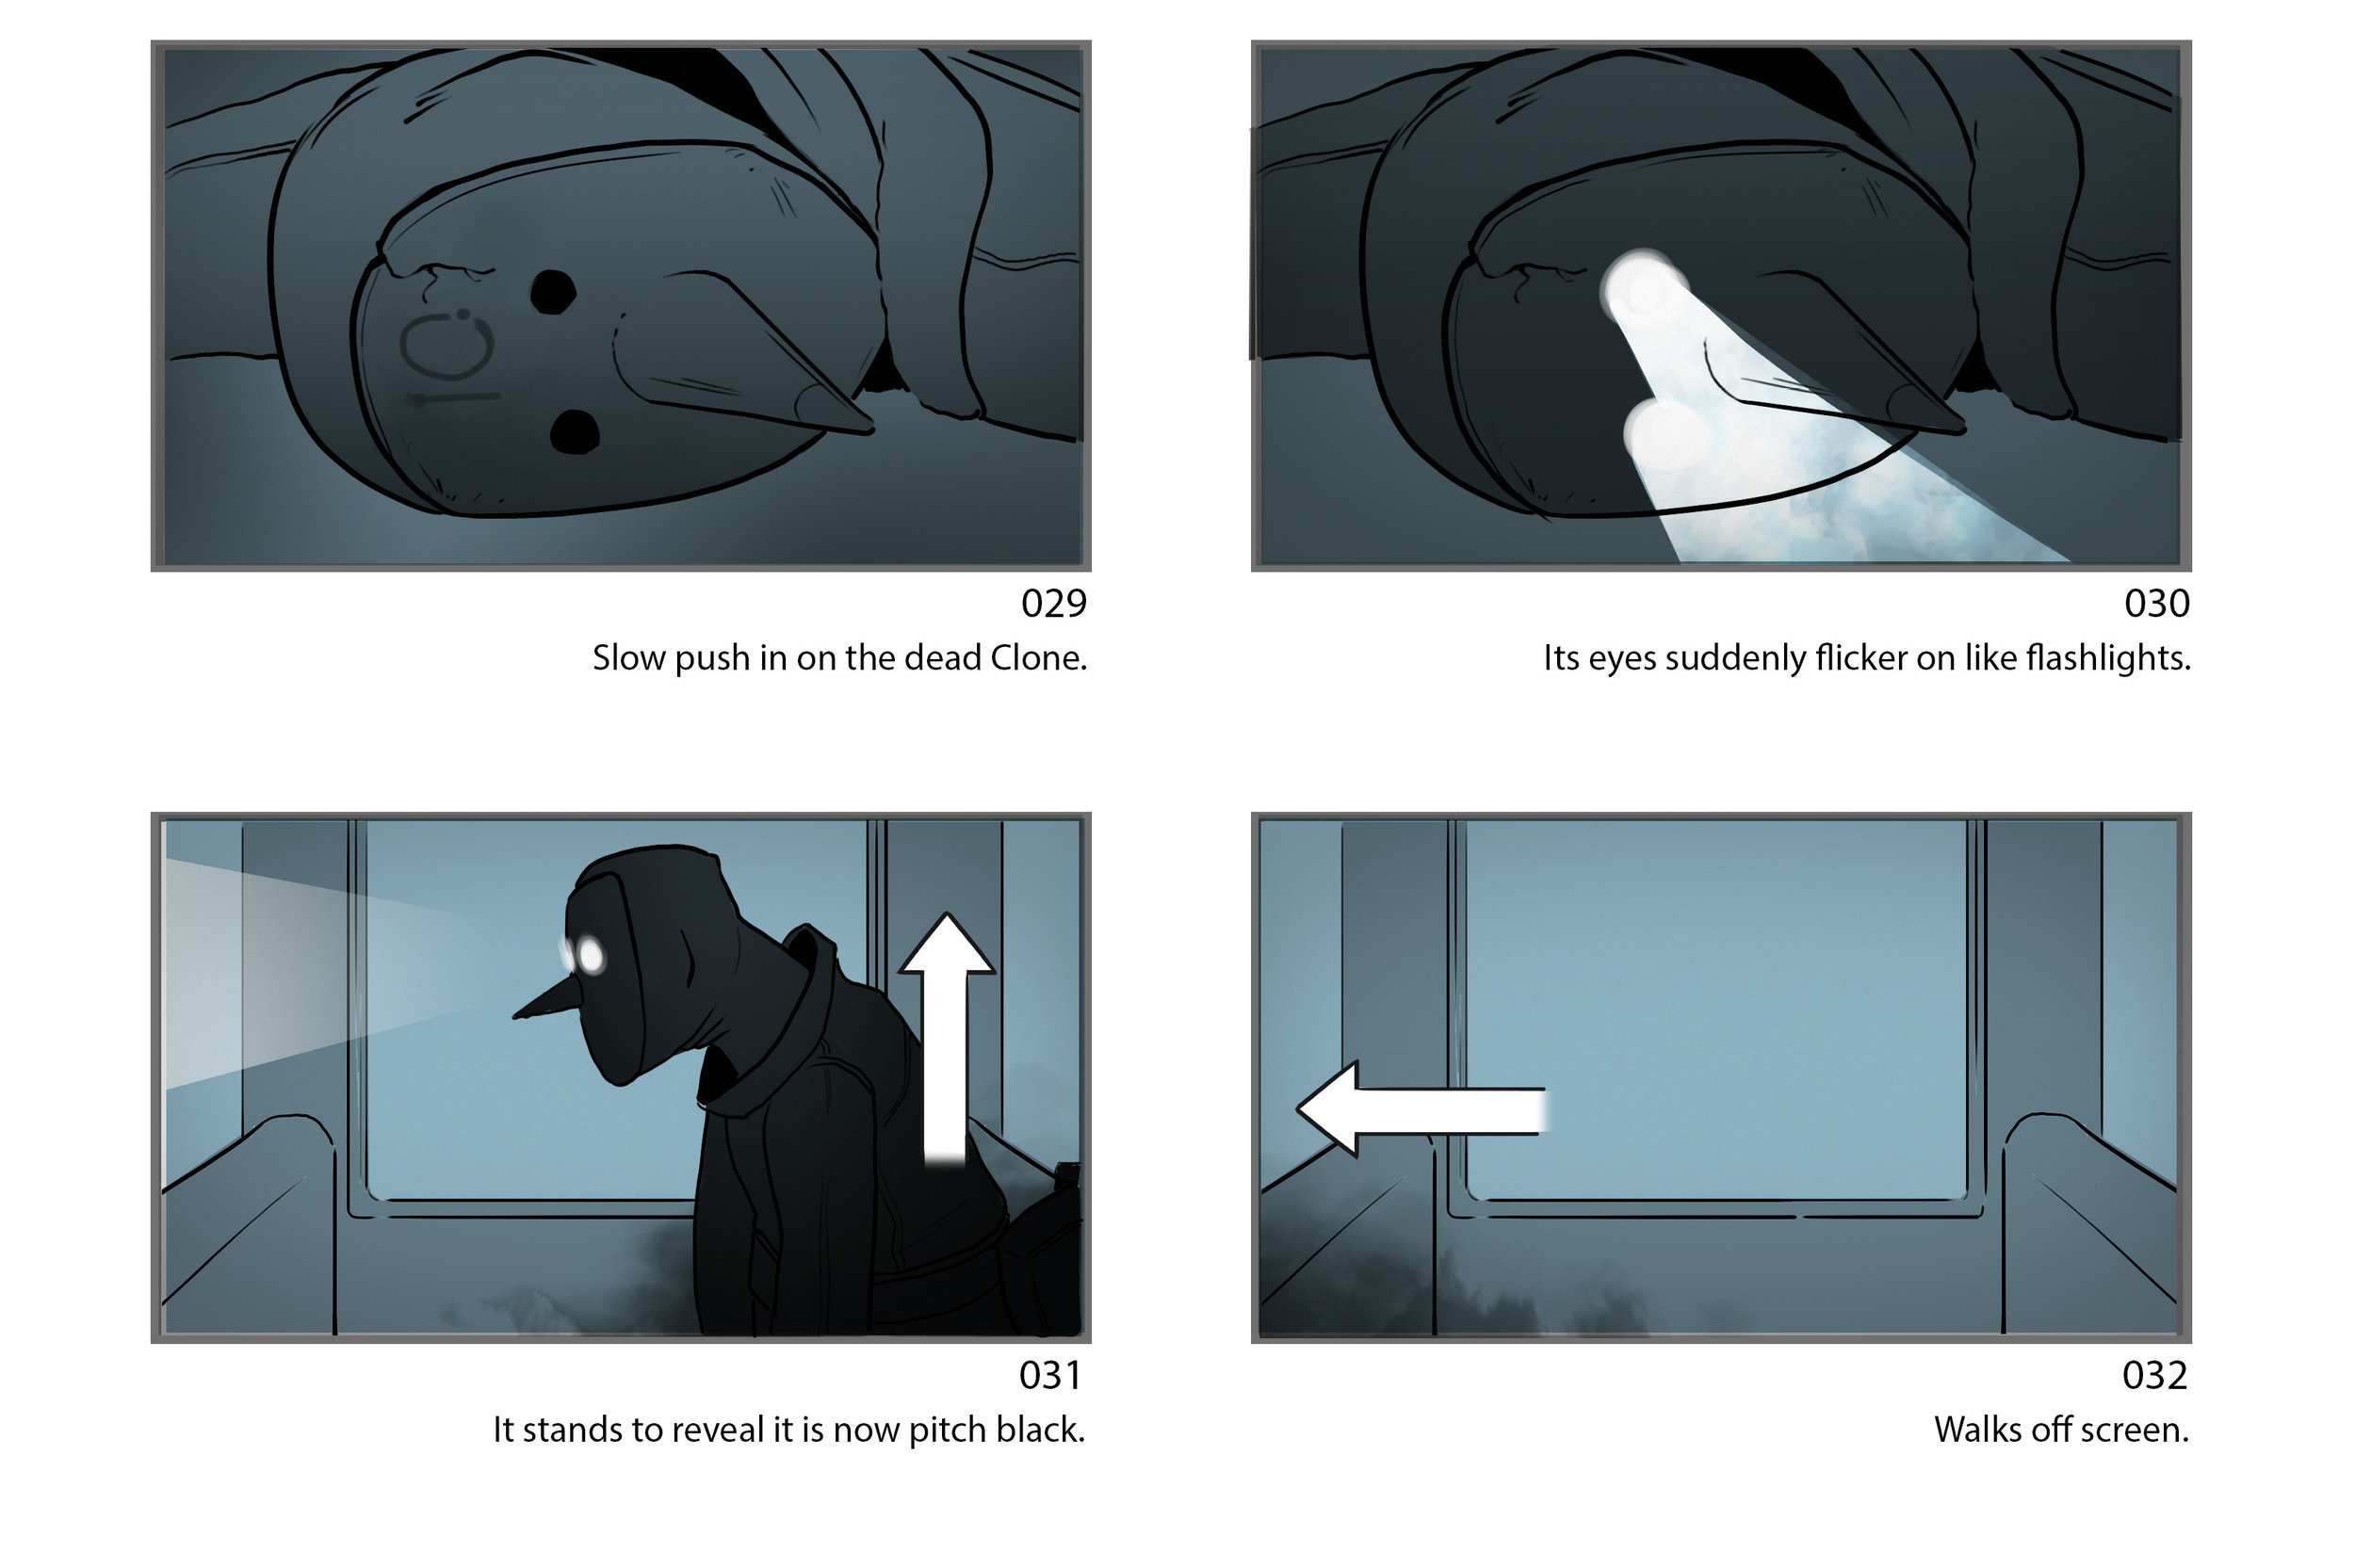 ASGHG_storyboards_0215-8.jpg